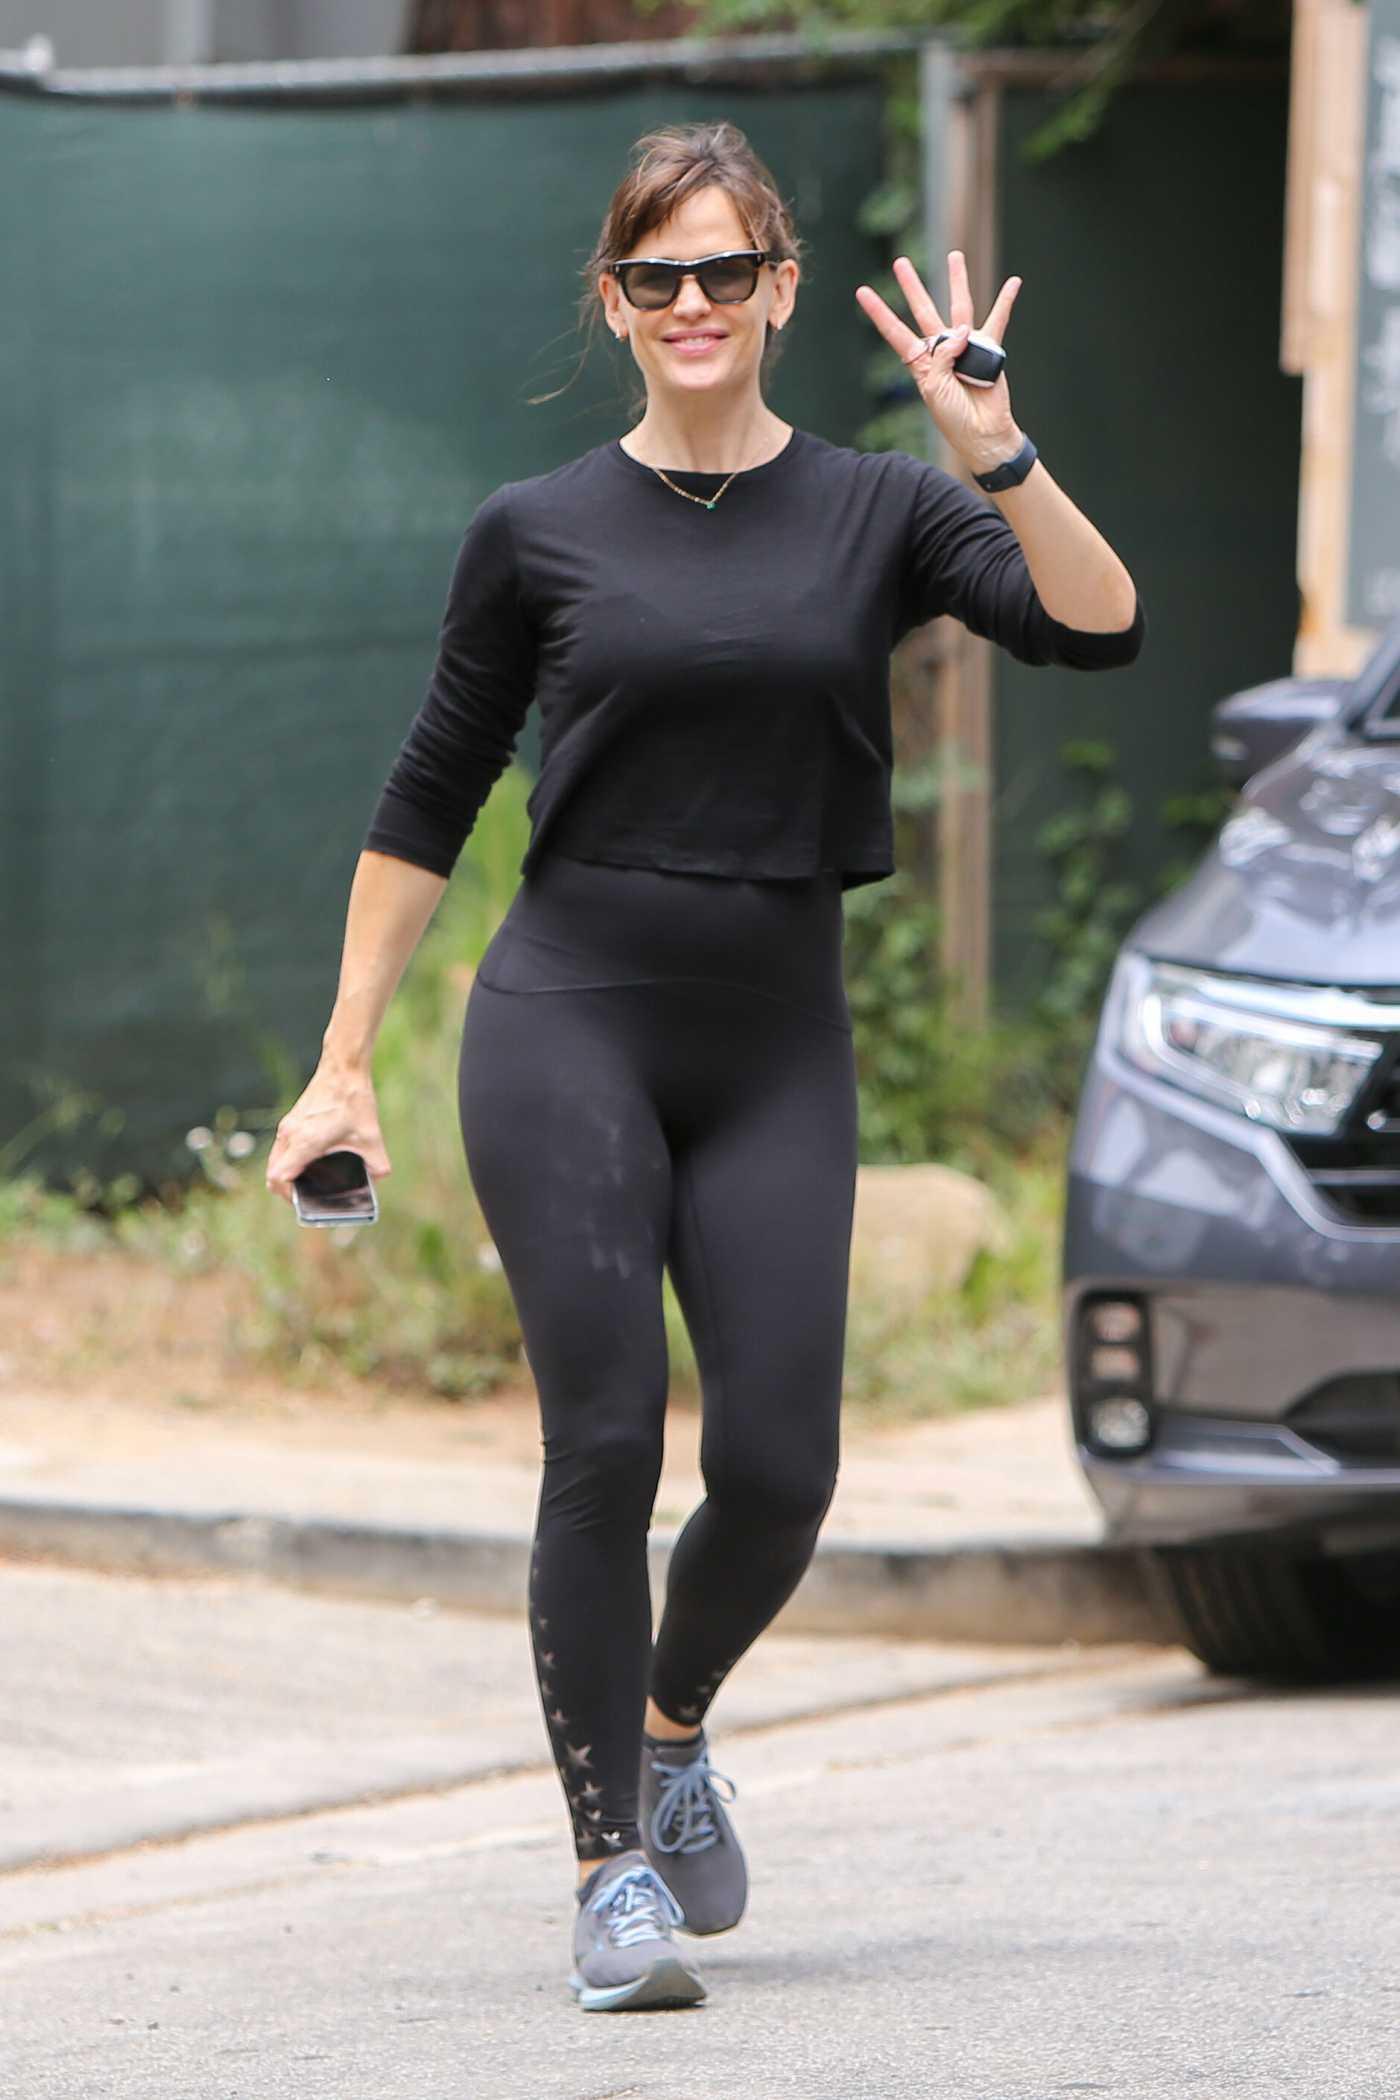 Jennifer Garner in a Black Workout Ensemble Was Seen Out in Brentwood 05/09/2021